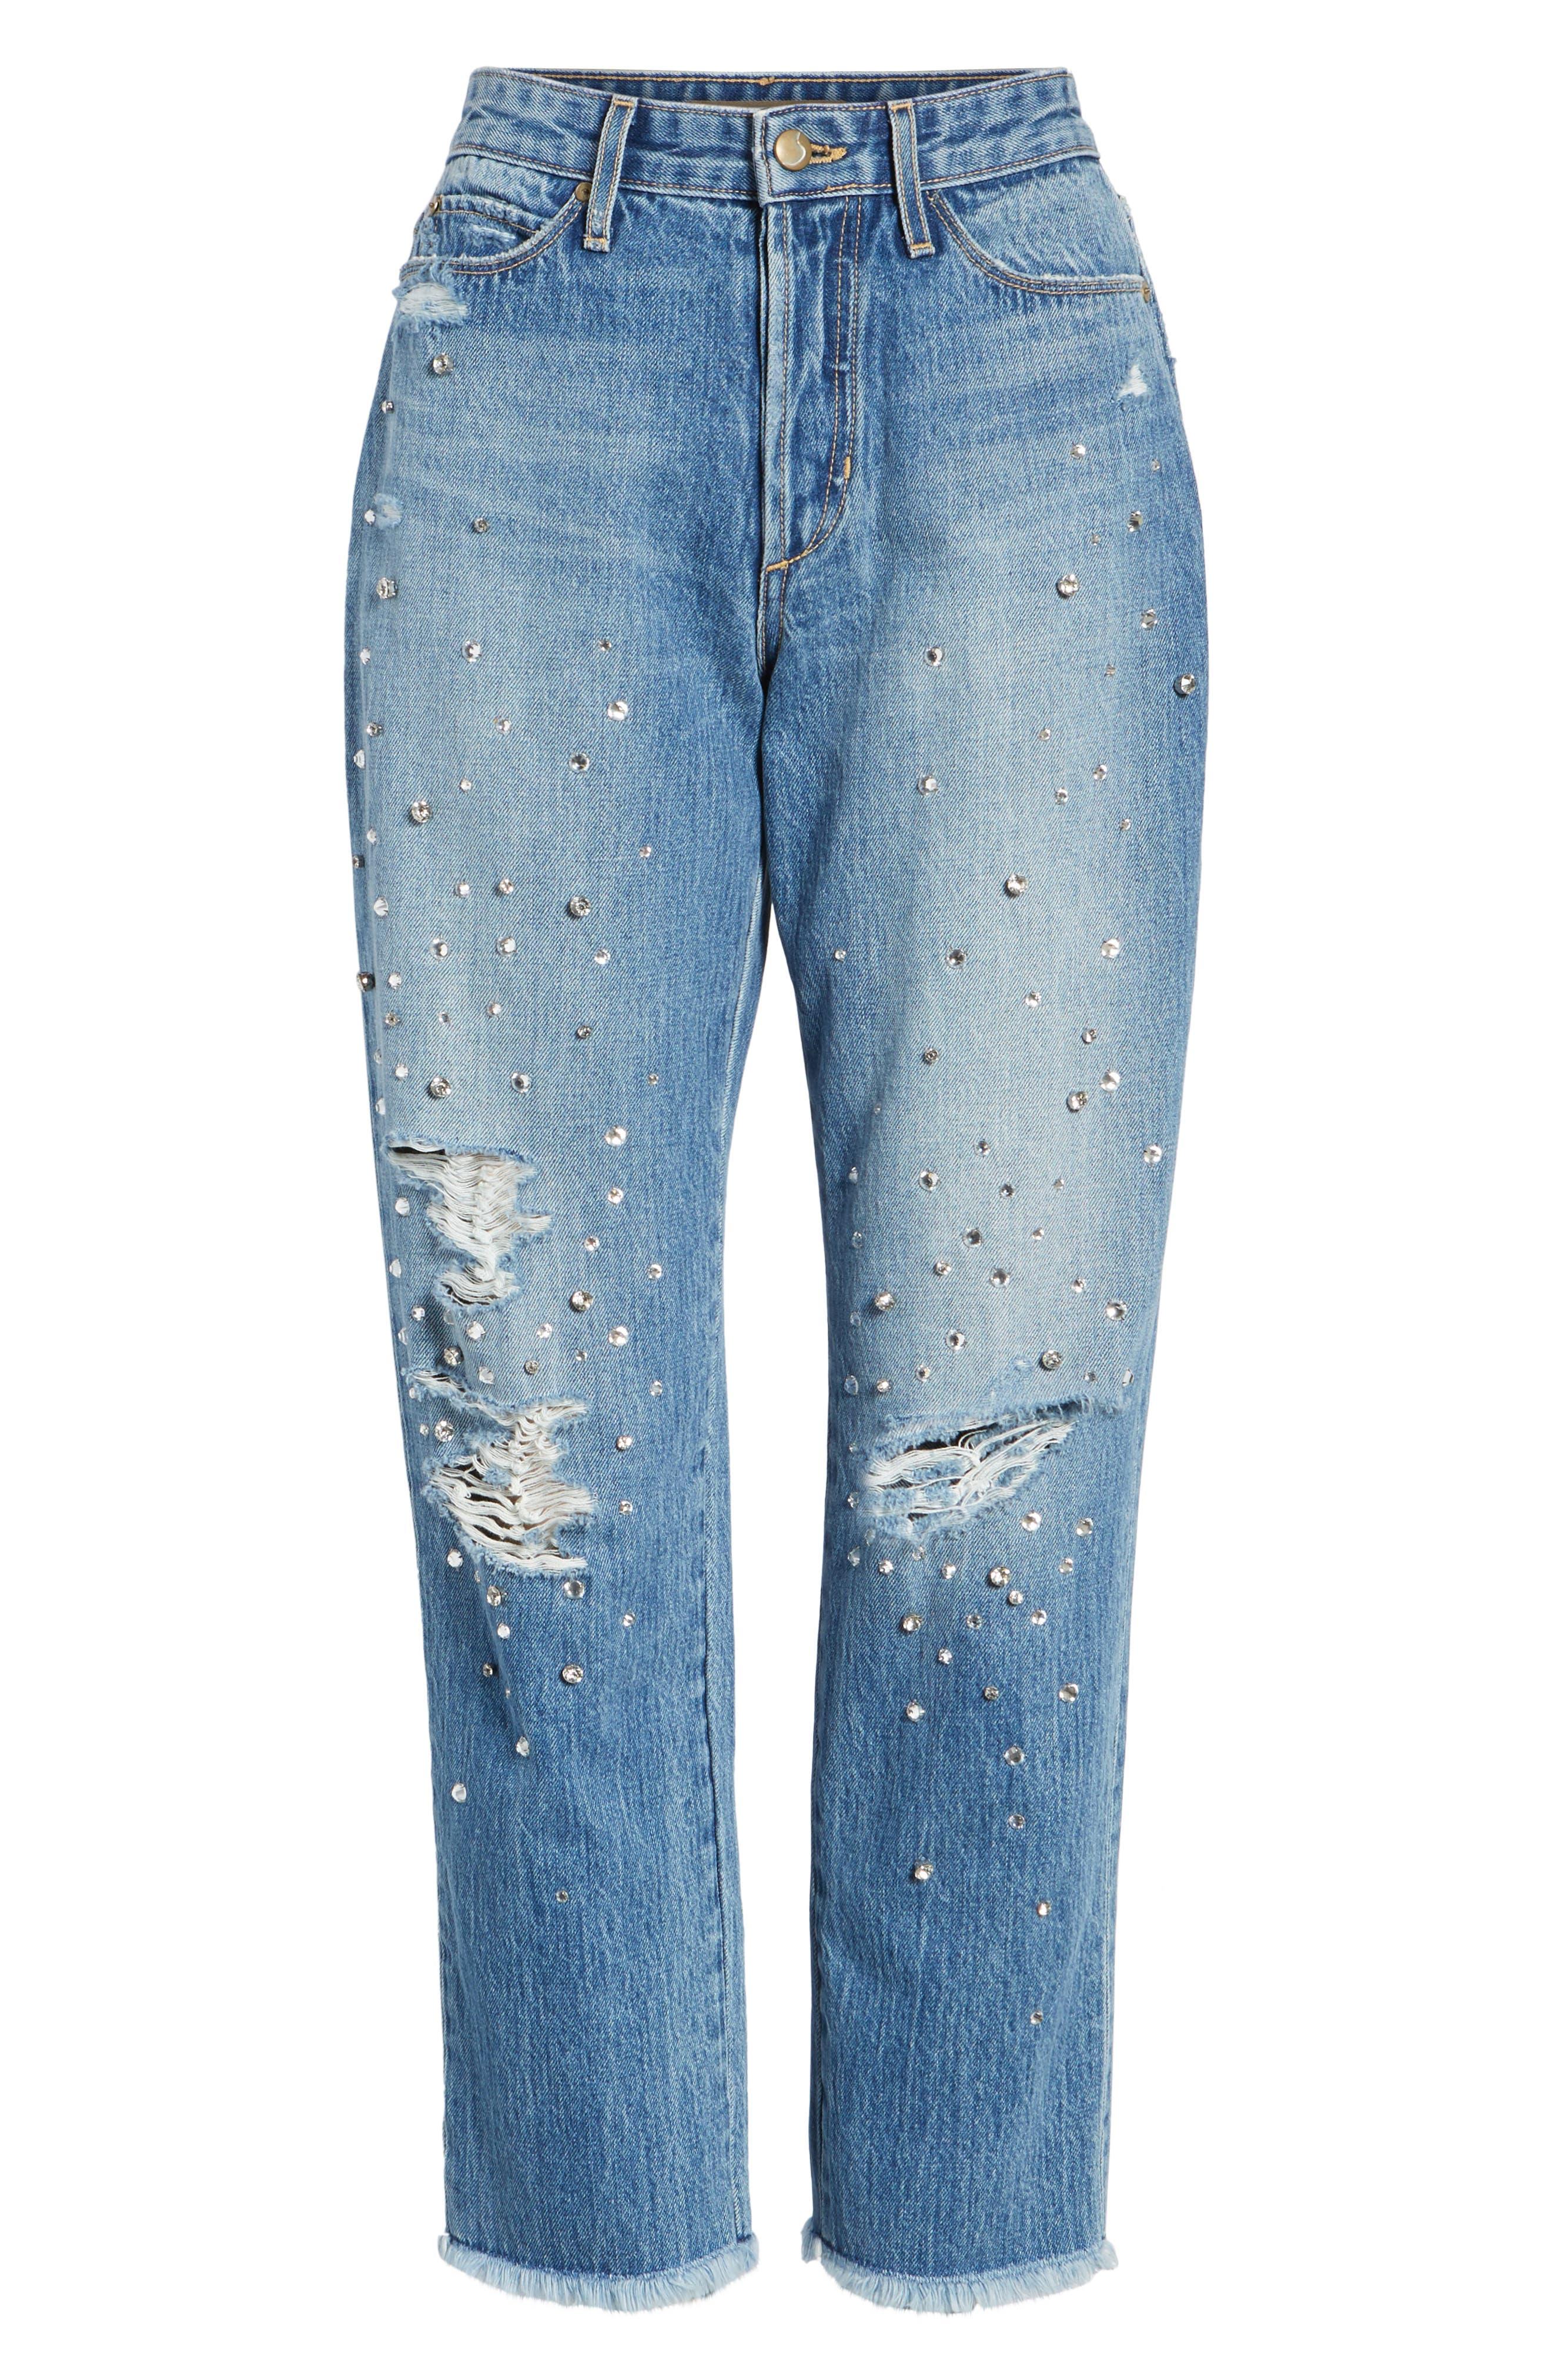 Jeans Smith Rhinestone Crop Boyfriend Jeans,                             Alternate thumbnail 6, color,                             450